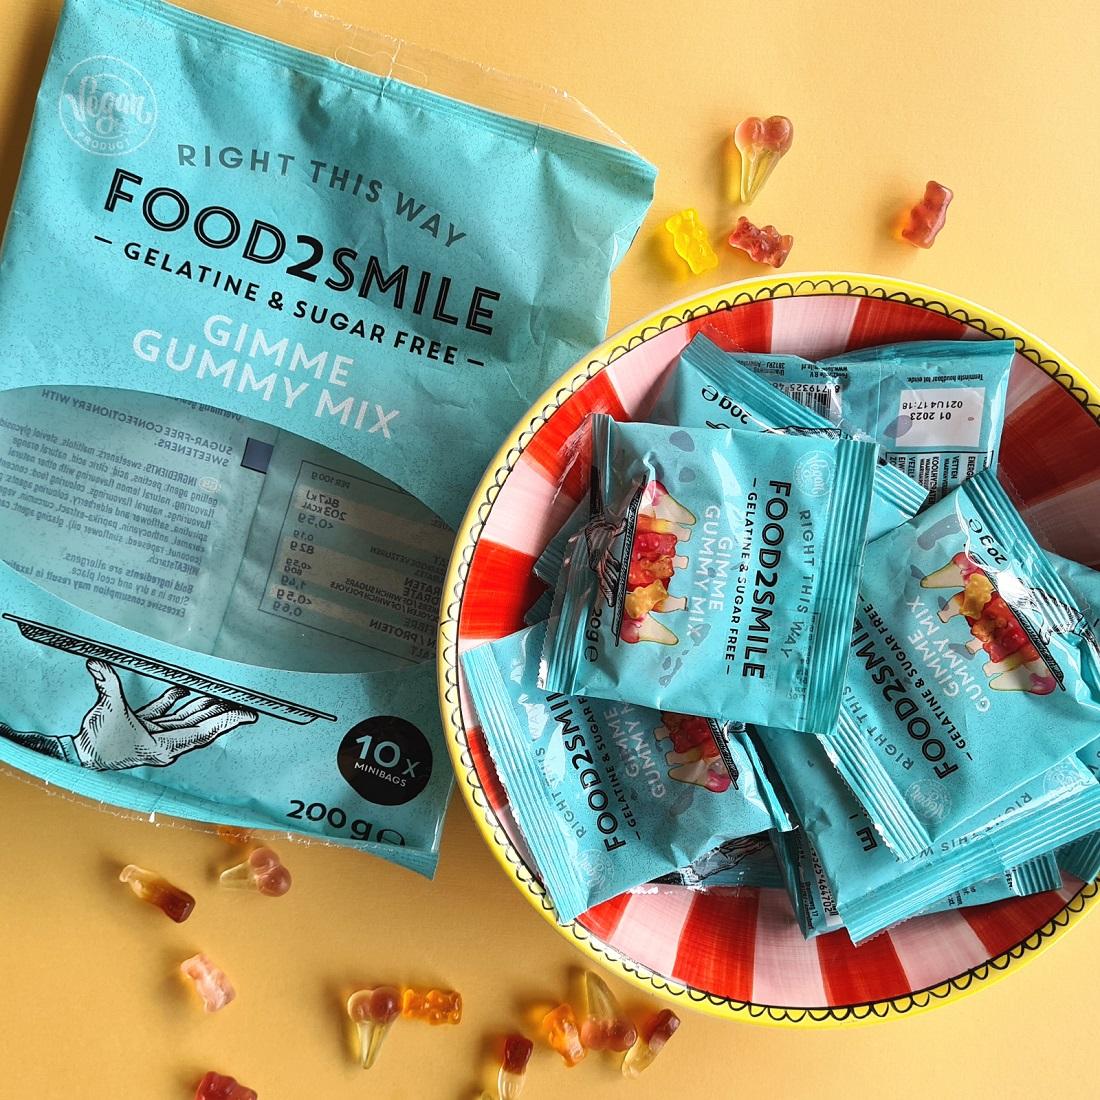 suikervrije traktatie food2smile